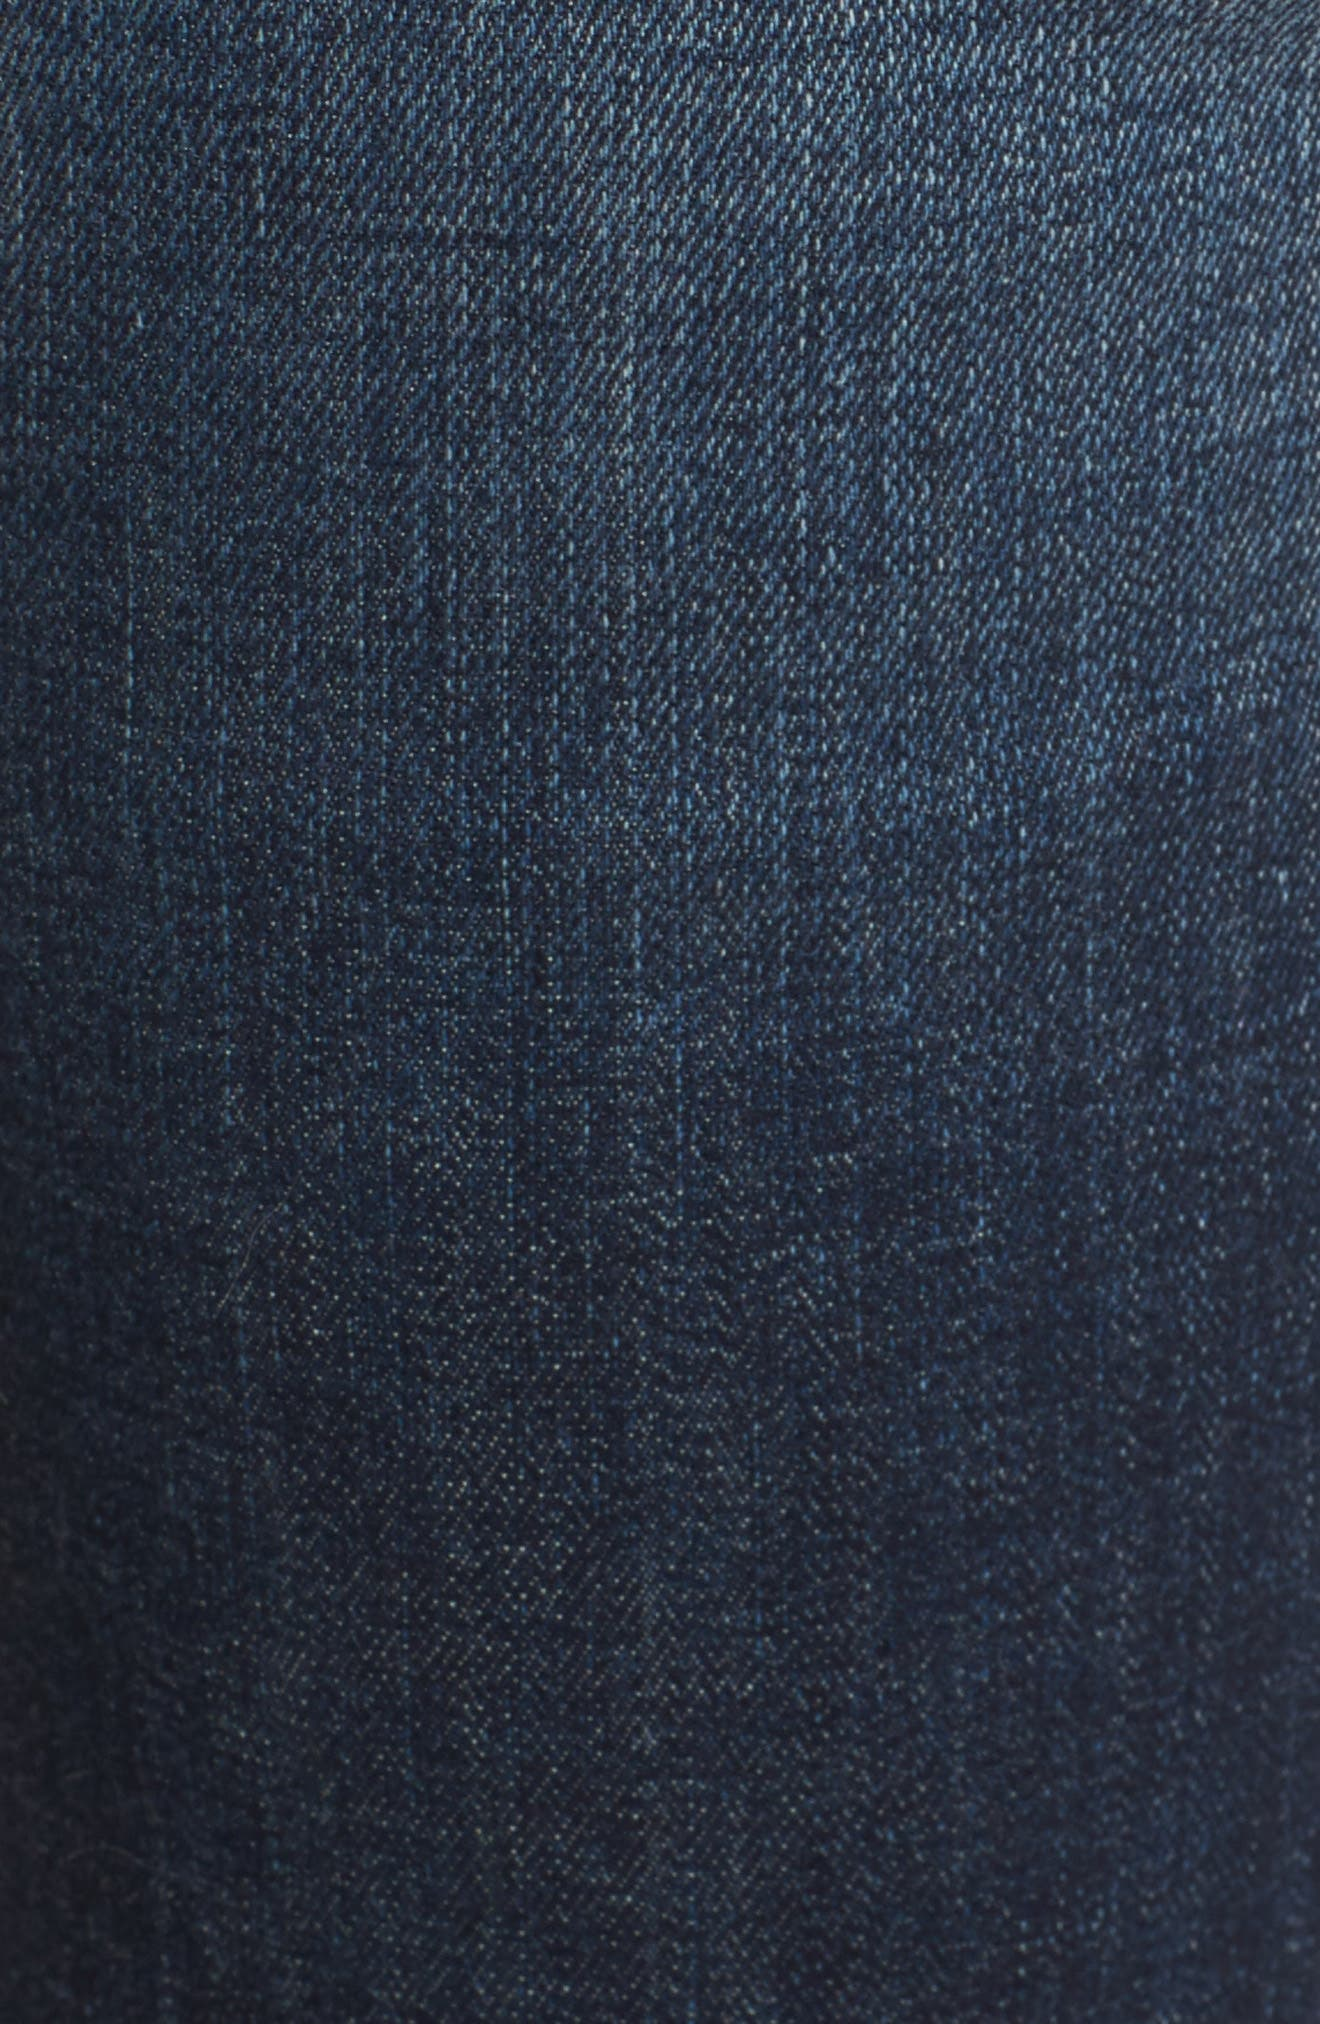 Alternate Image 5  - McGuire Newton High Waist Skinny Jeans (One Thousand Suns)